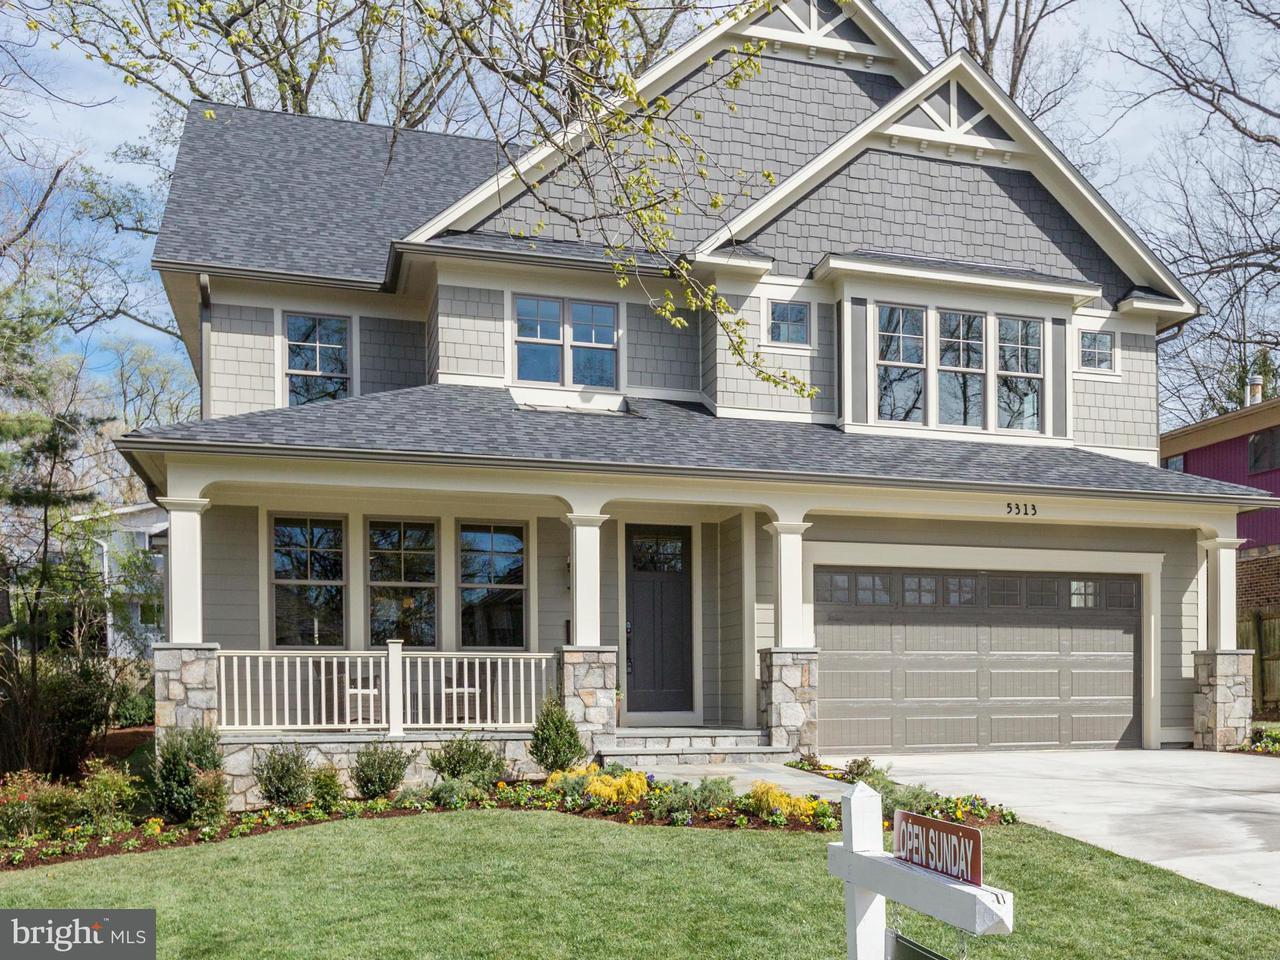 Single Family Home for Sale at 5313 WAPAKONETA Road 5313 WAPAKONETA Road Bethesda, Maryland 20816 United States